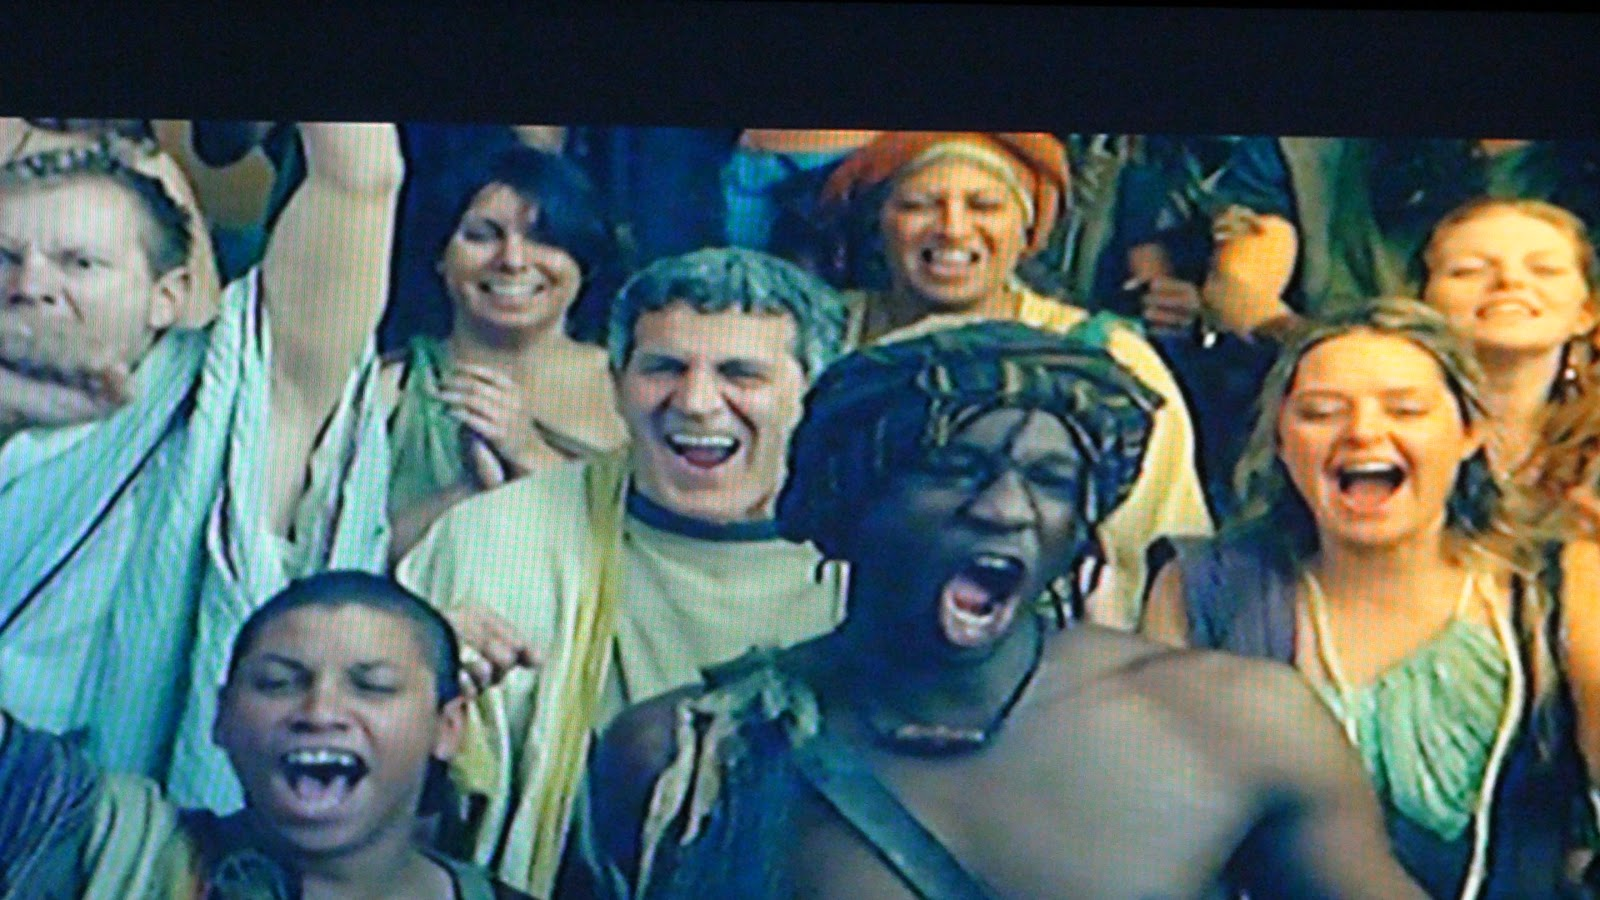 http://4.bp.blogspot.com/_ahWcGWlSZBM/TPMVM4gPVzI/AAAAAAAAA4Y/208wvyf9jl8/s1600/Spartacus+Blood+and+Sand+%2528Crowd+in+Ancient+Rome%2529.JPG